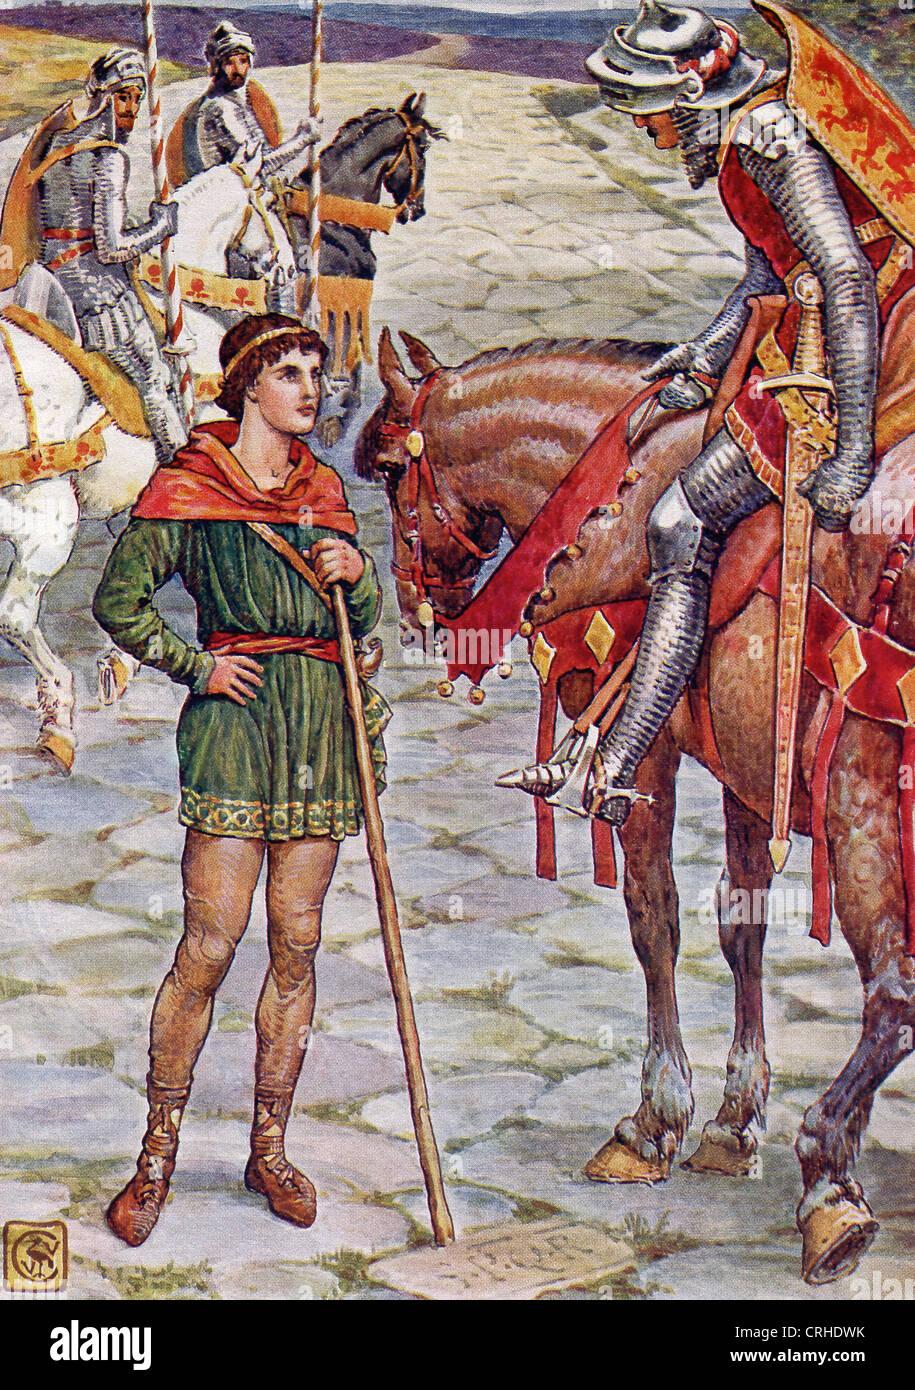 Perceval un chevalier de la table ronde du roi arthur - La table ronde du roi arthur ...